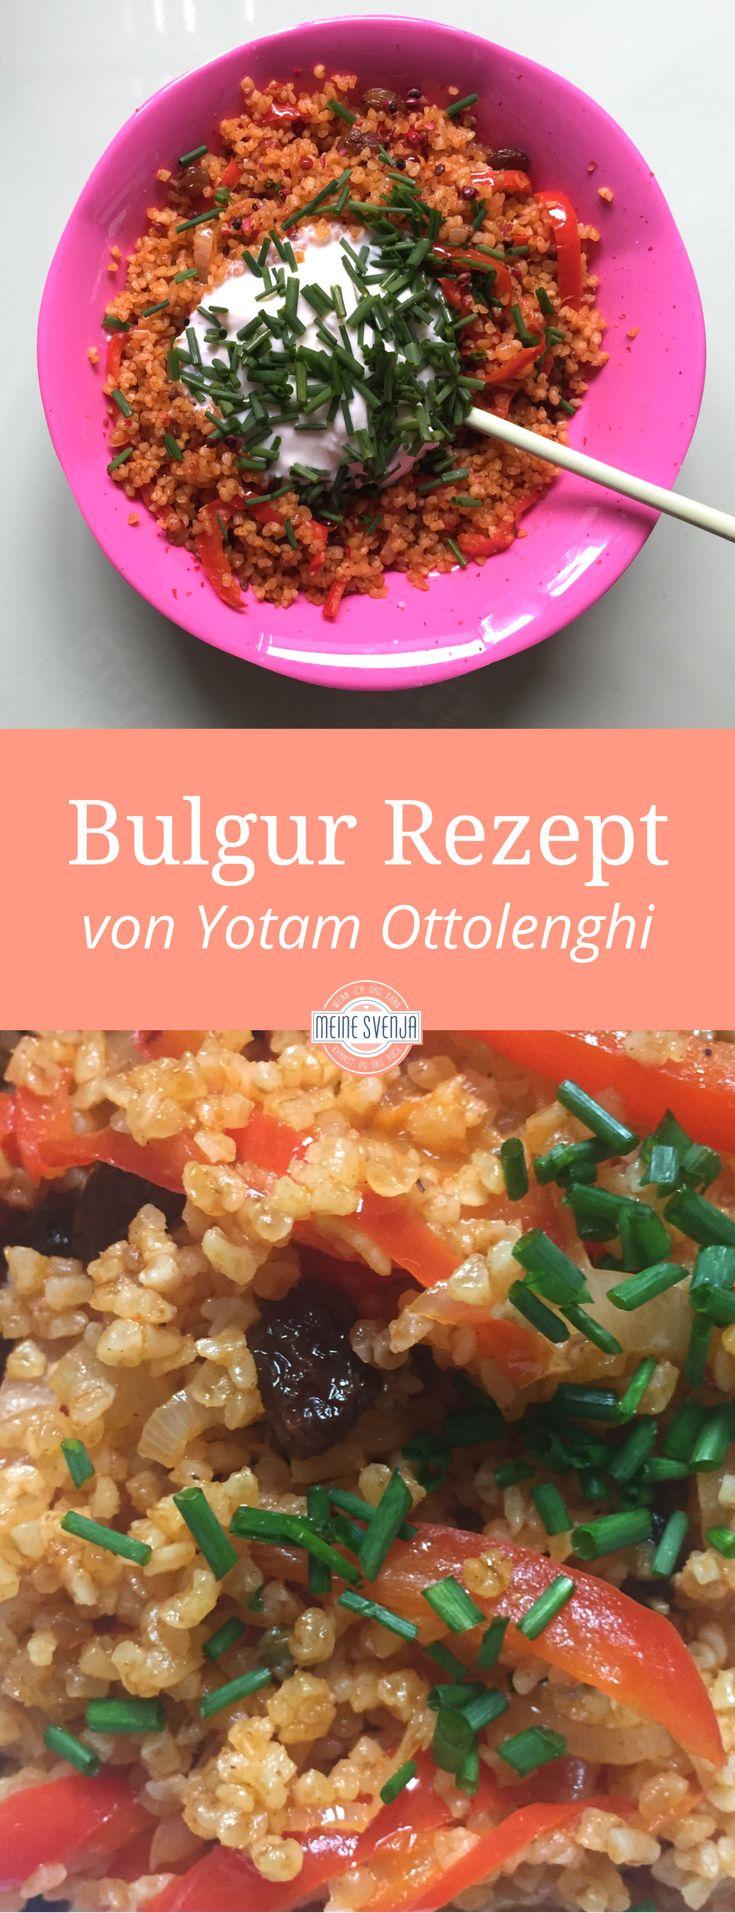 Bulgur Rezept von Yotam Ottolenghi - orientalisches veganes Rezept